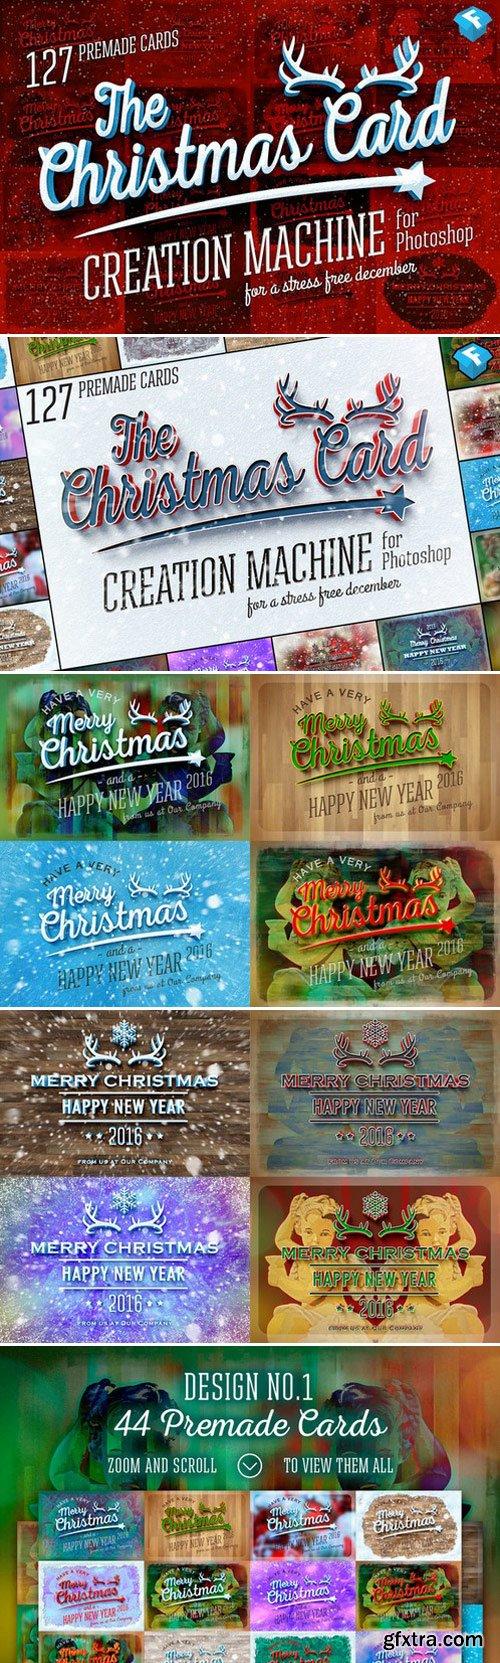 CM - Christmas Card Creation Machine 419261